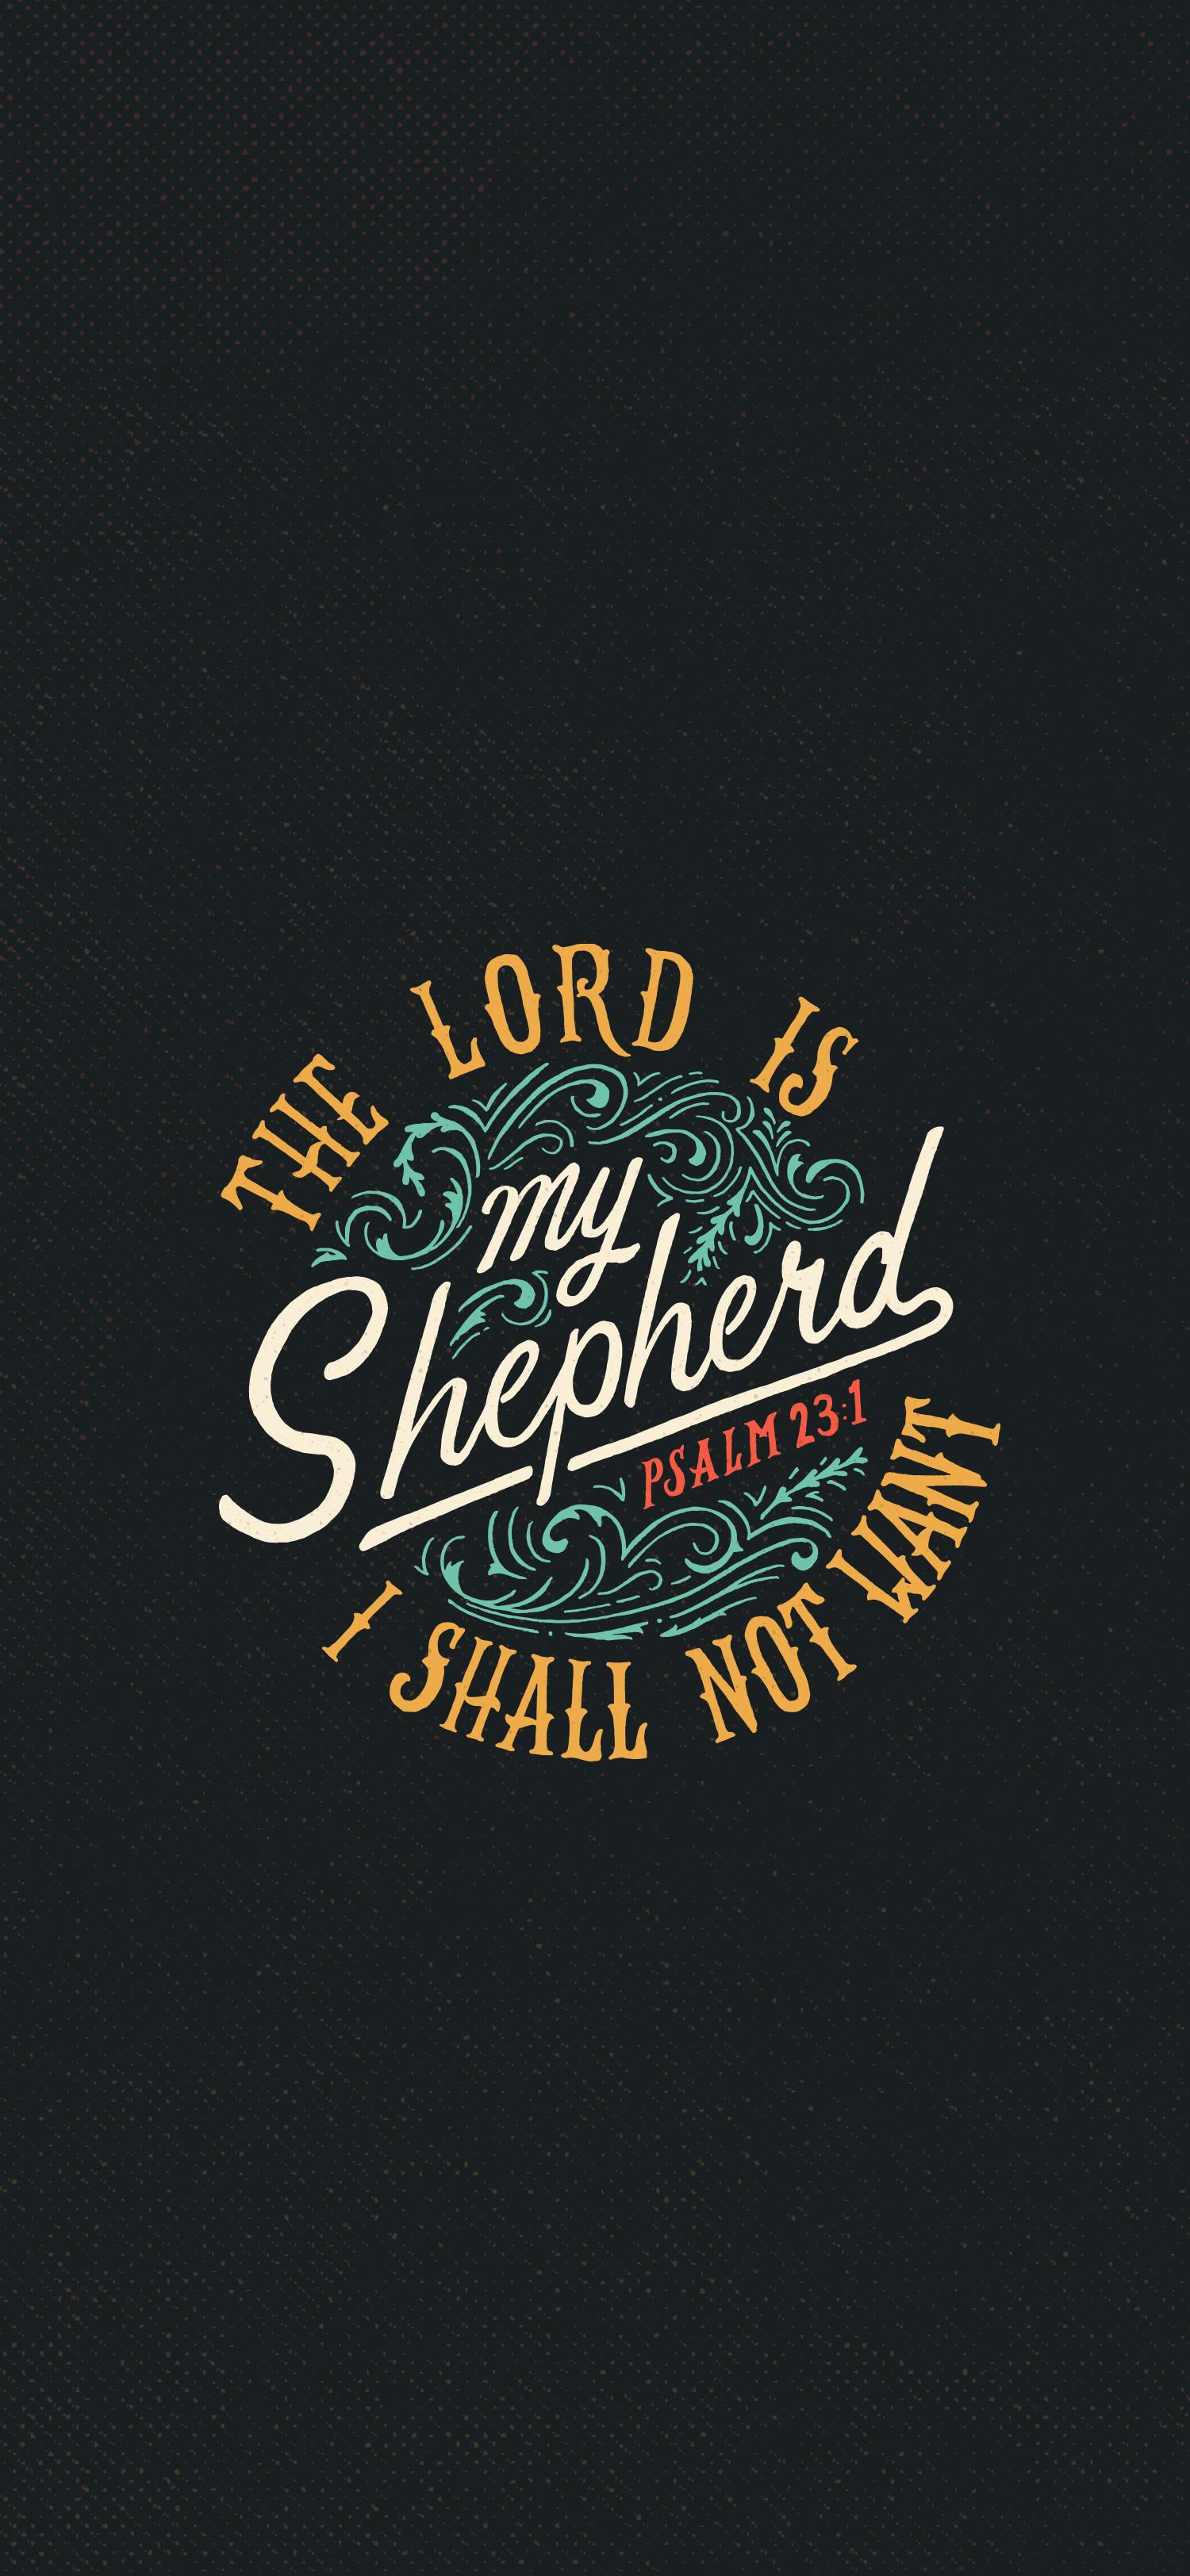 Psalm 23 1 Scripture Type